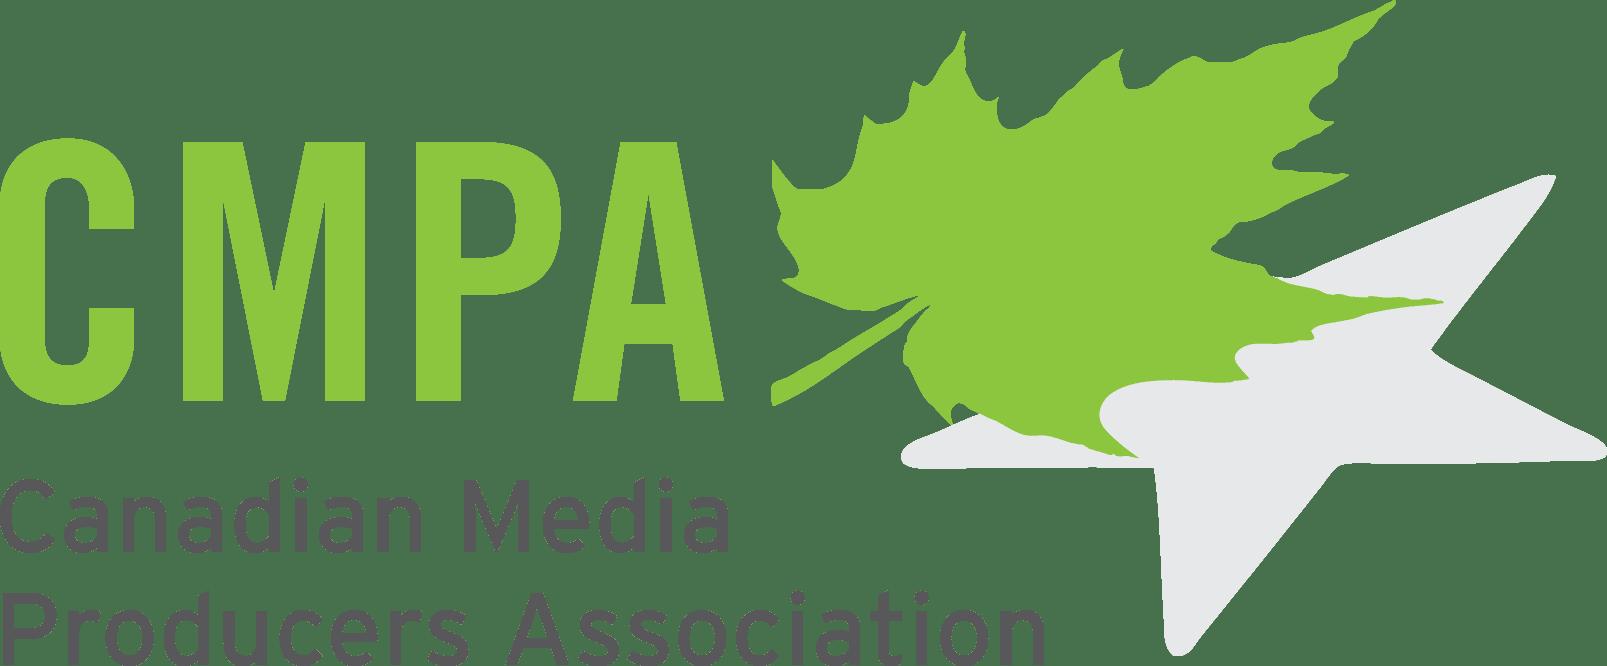 CMPA Health Plus Insurance